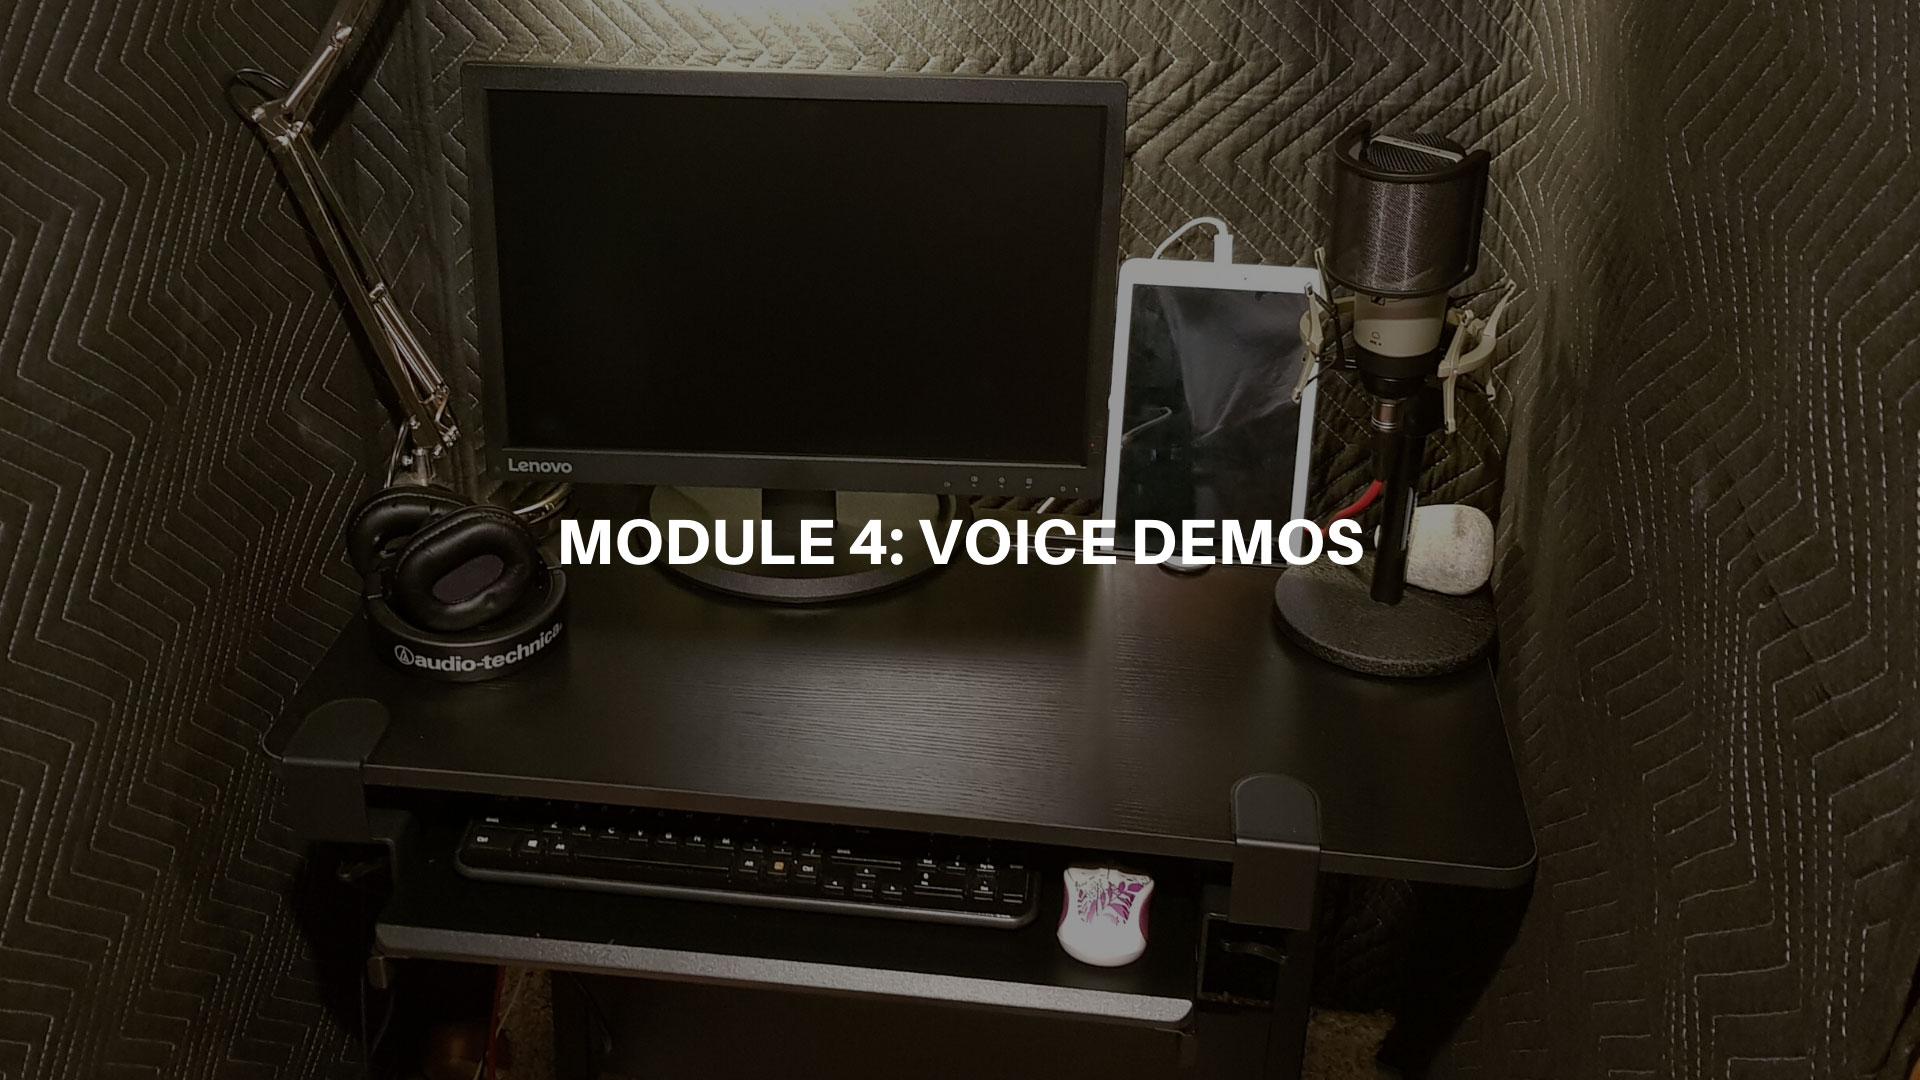 Module 4 - Voice Demos